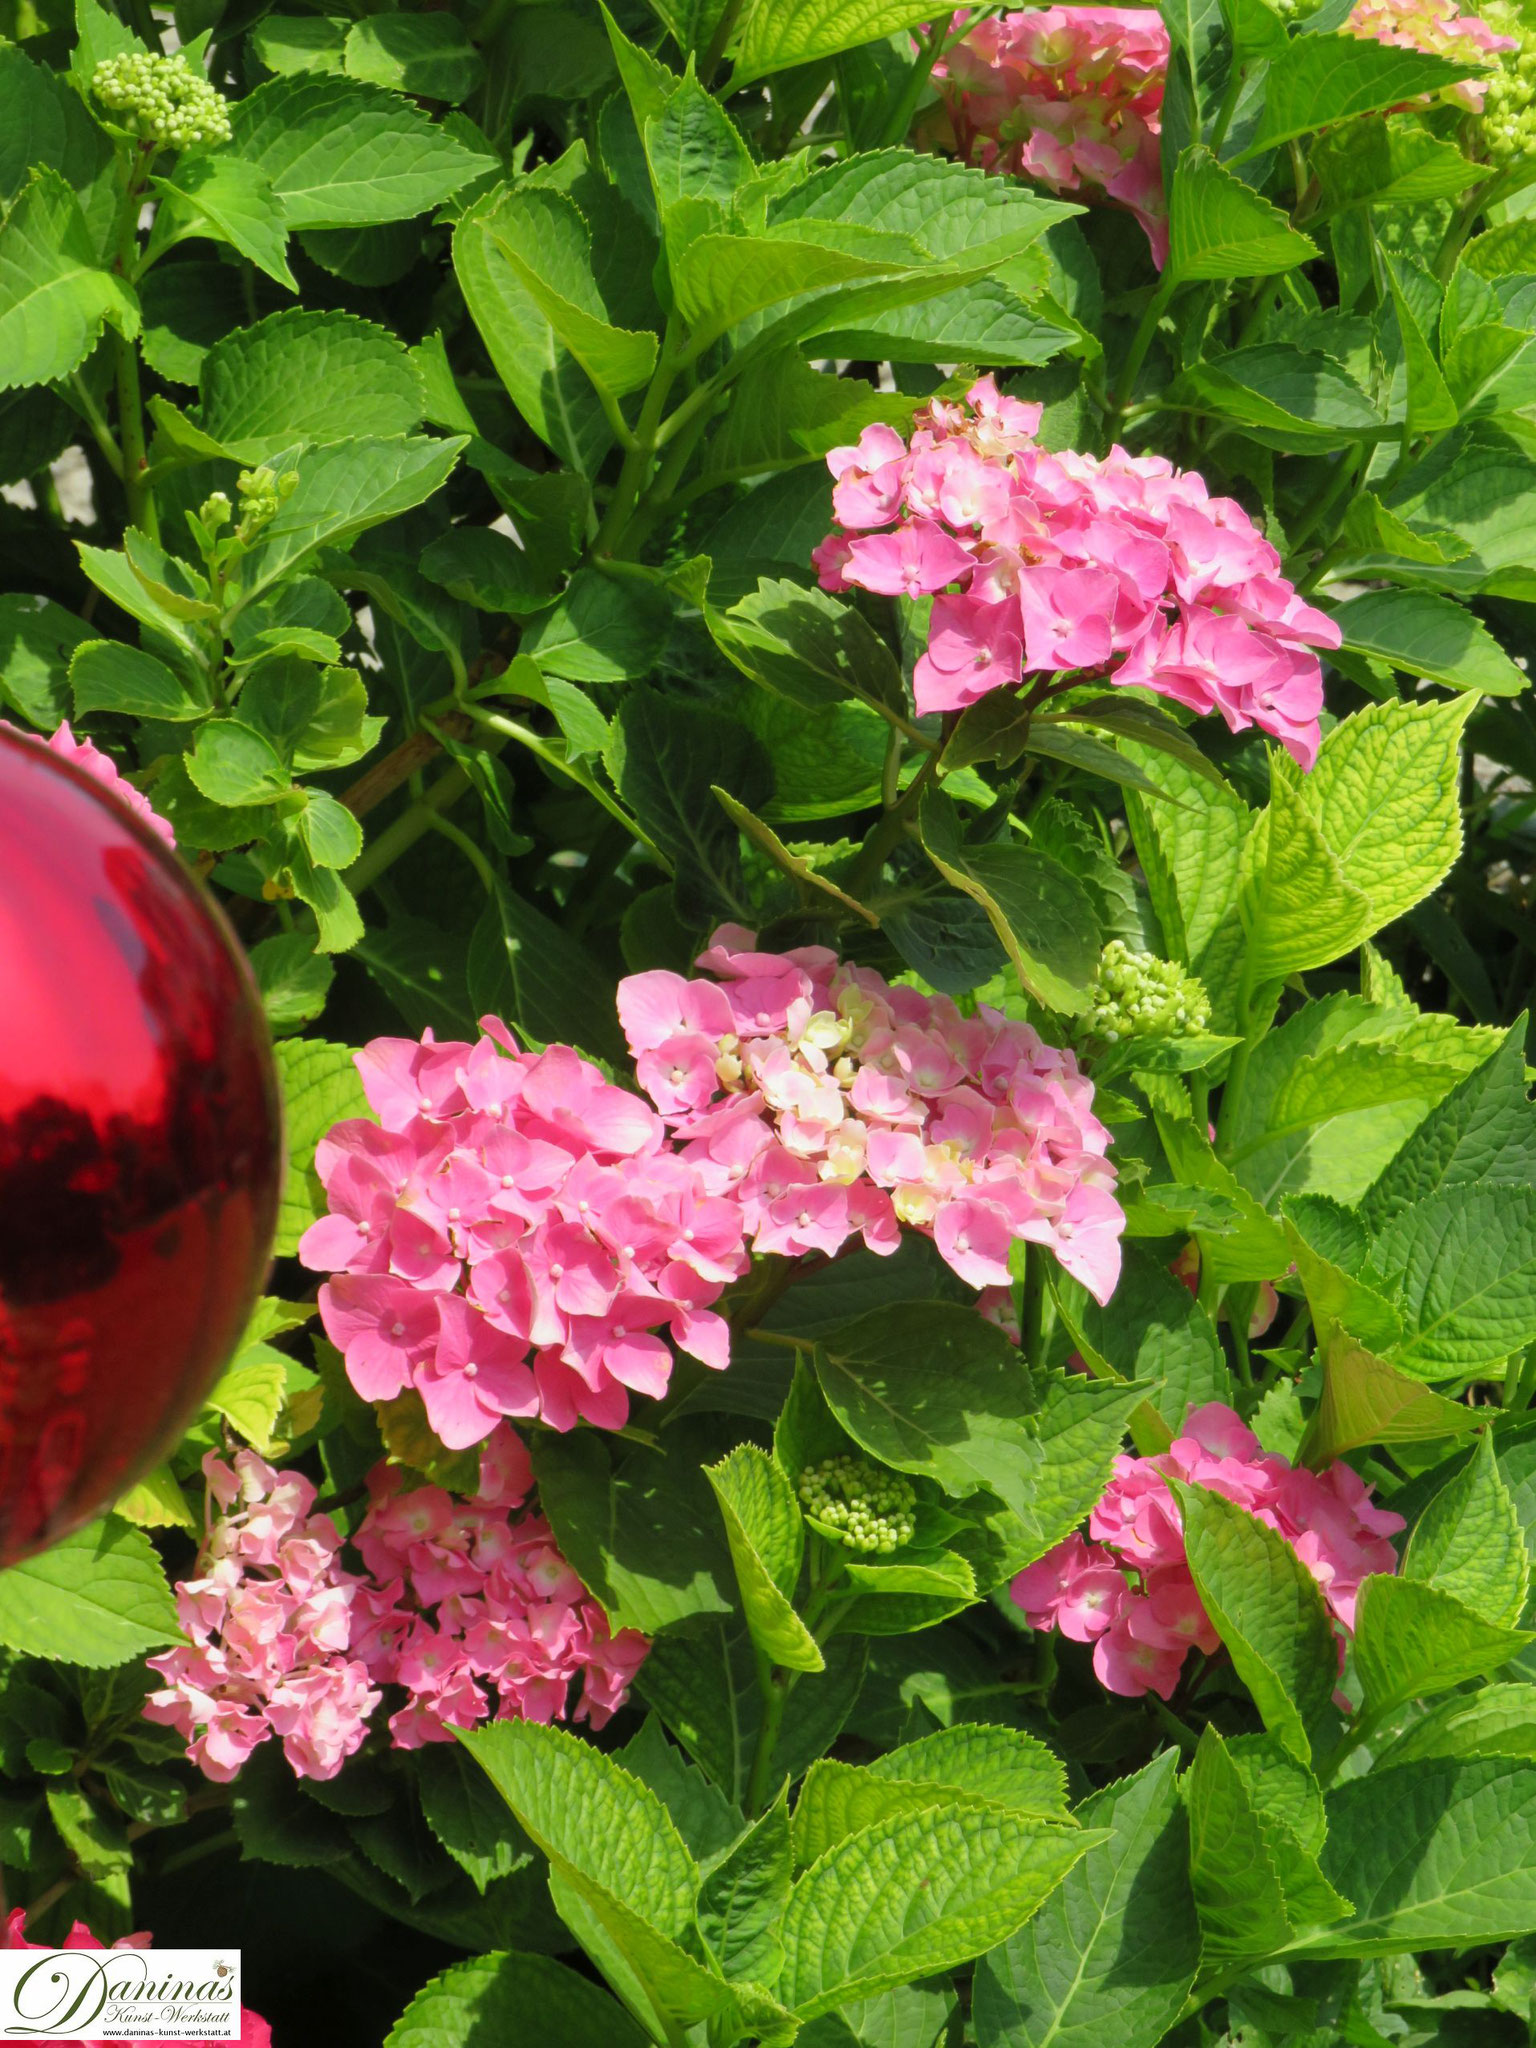 Romantischer Hortensien Garten Bilder by Daninas-Kunst-Werkstatt.at